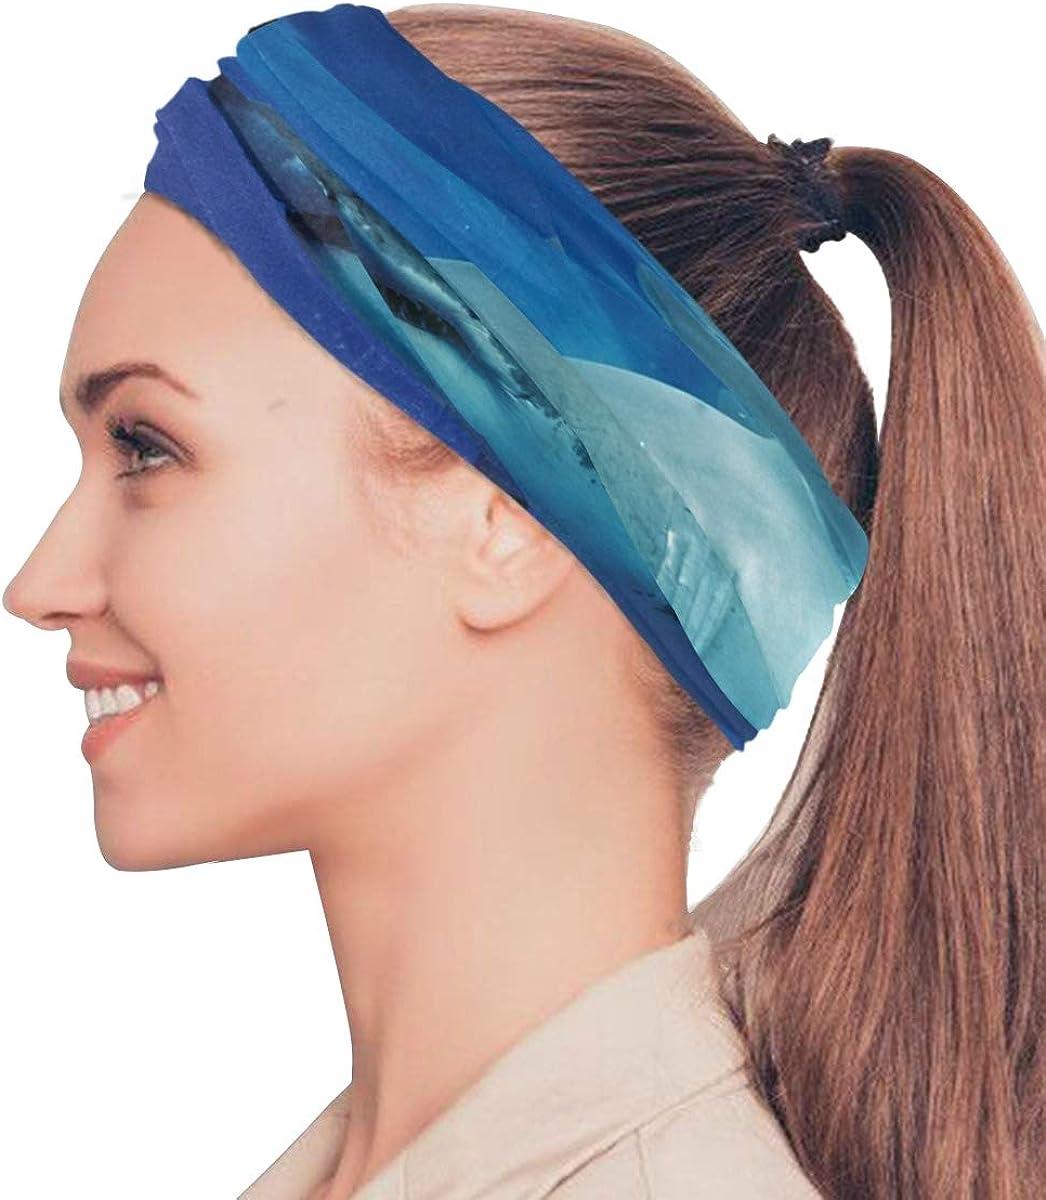 WHITE SHARK Balaclava Womens Headband Scarf Mens Versatile Bandana, Muffler, Neck Gaiter, Magic, Facemask Headwear